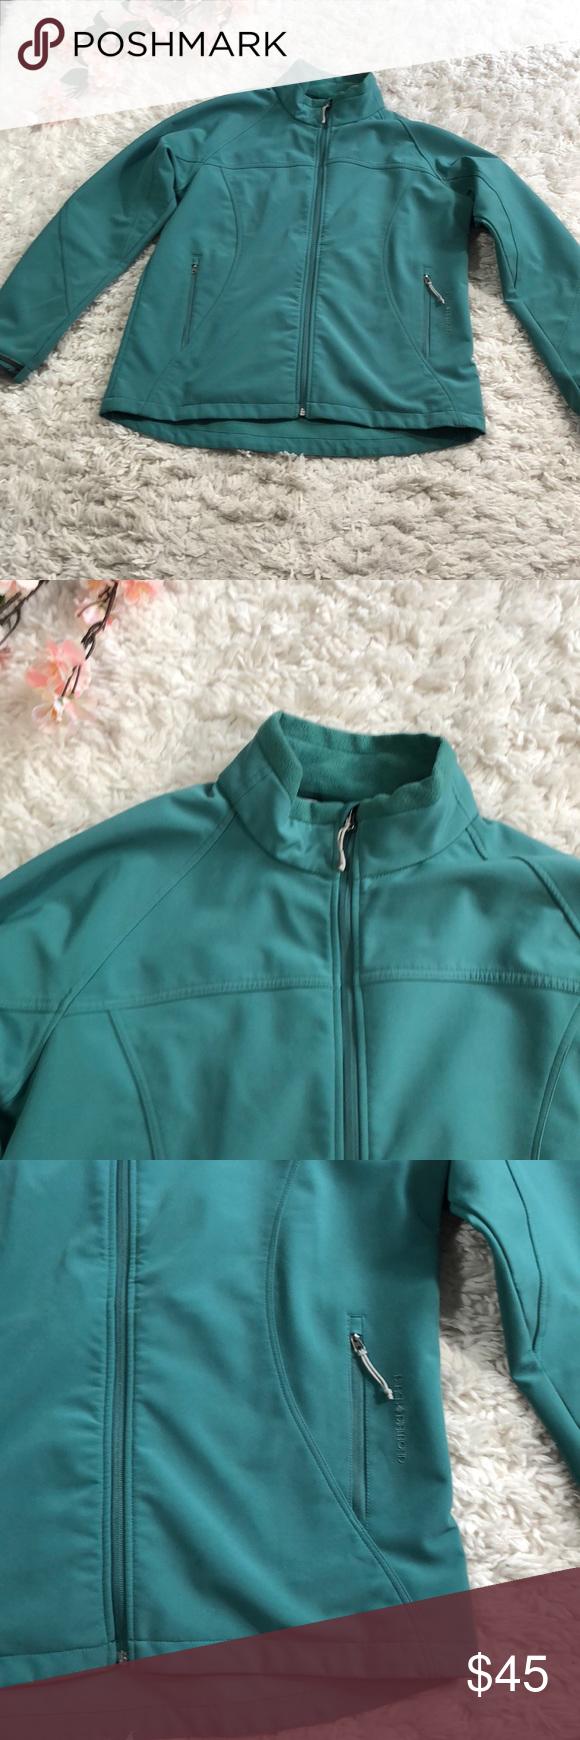 5 25 sale black diamond aqua light jacket in 2018 my posh